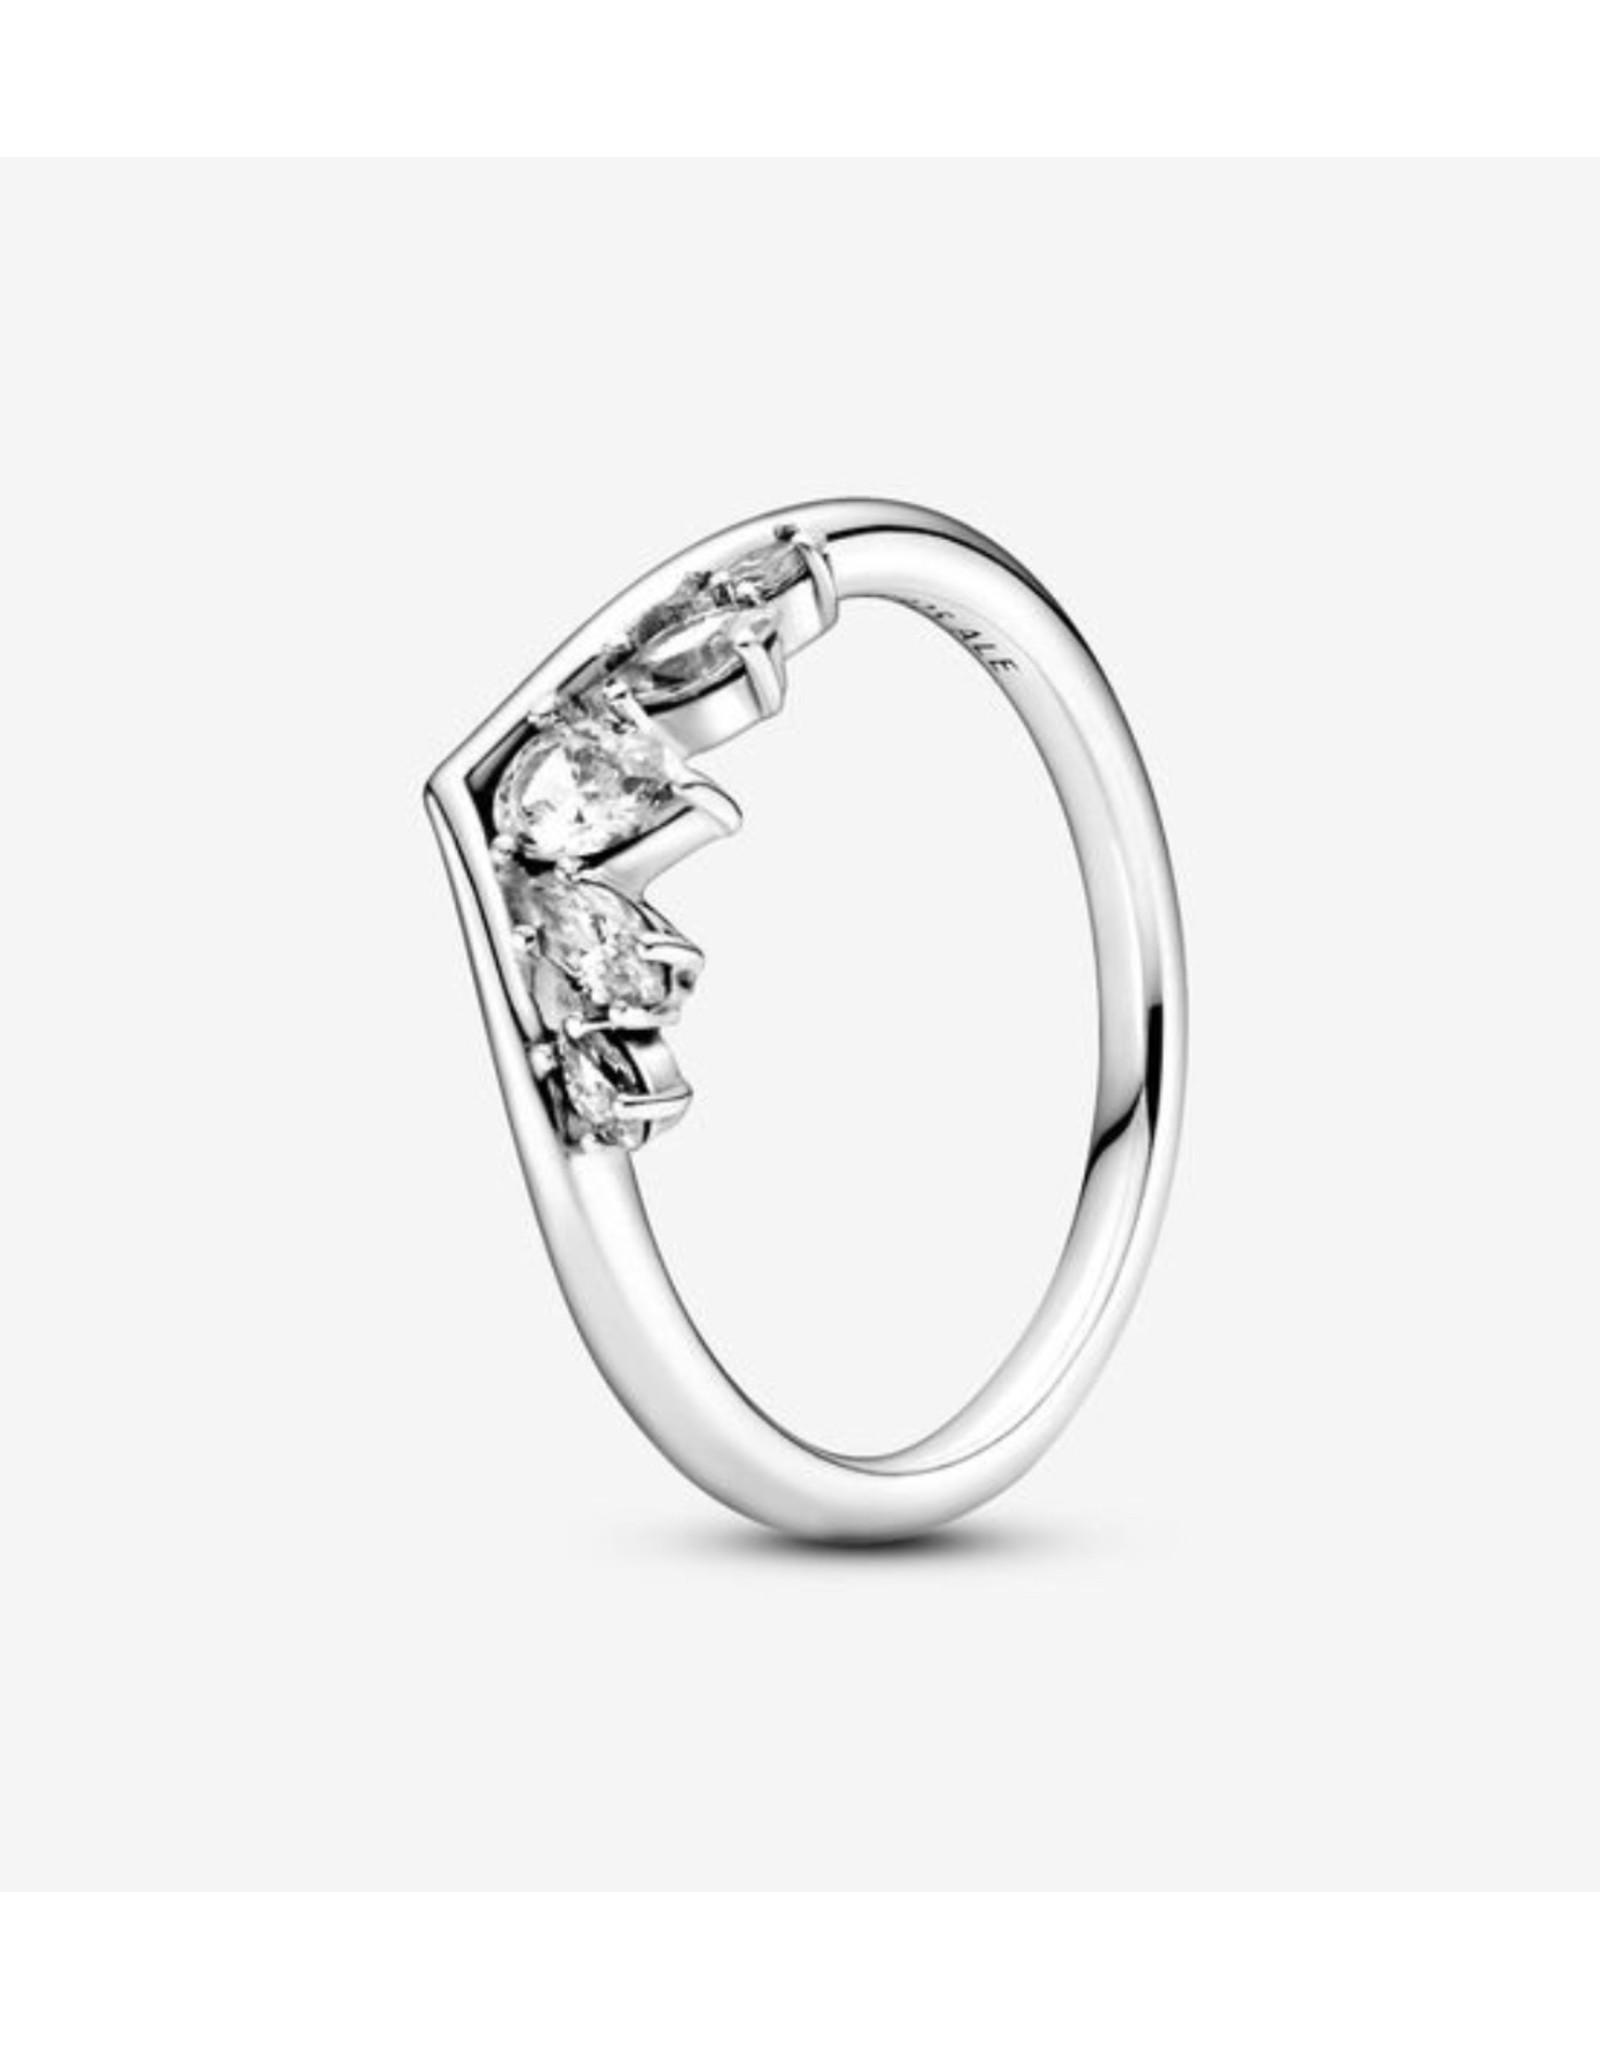 Pandora Pandora Ring,199109C01, Sparkling Pear&Marquise Wishbone, Clear CZ